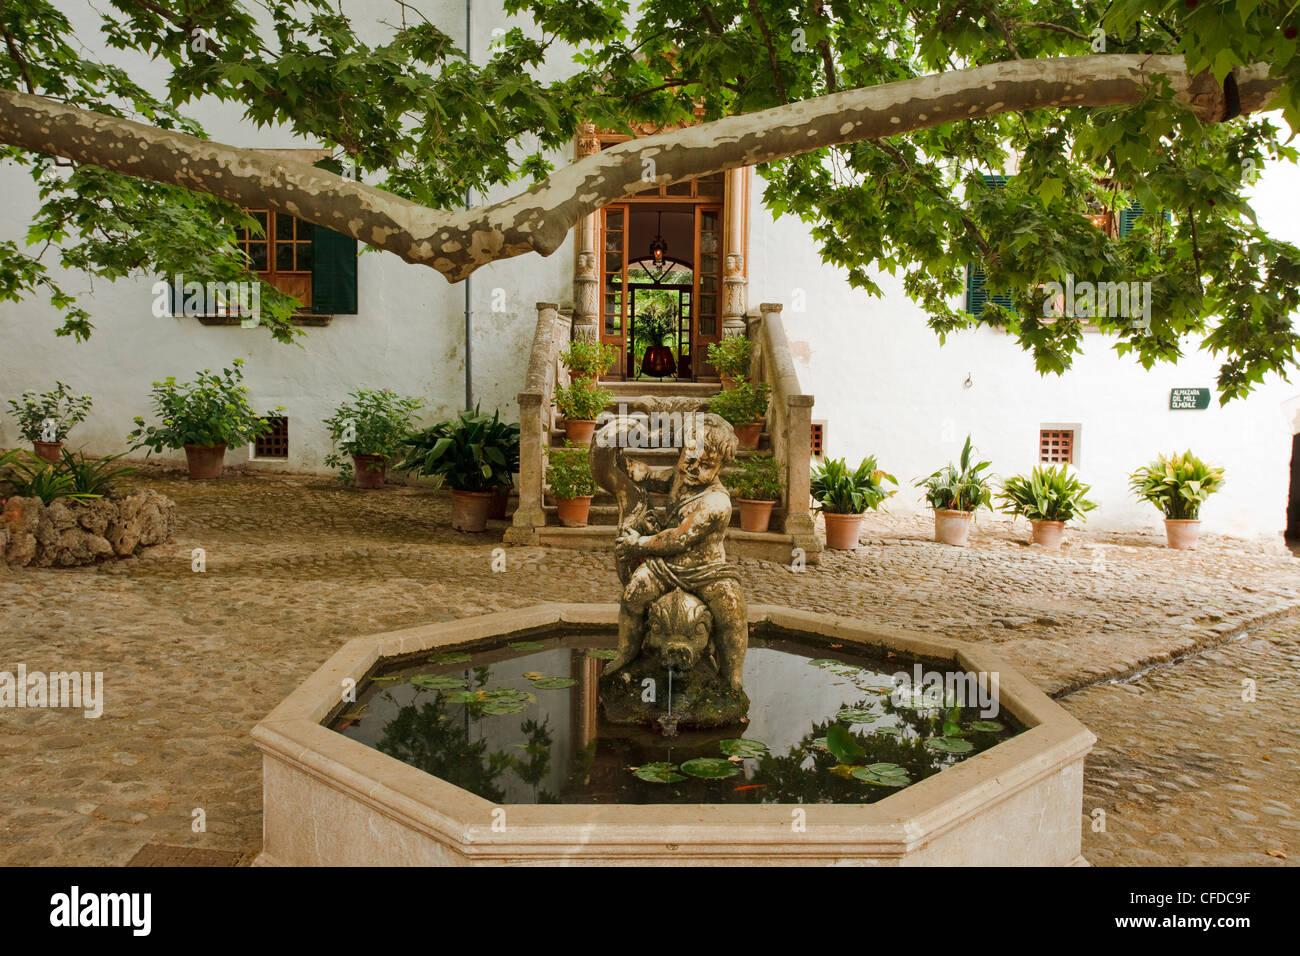 Jardins d Alfabia, moorish country estate, 14 15 century, Bunyola, Mallorca, Balearic Islands, Spain, Europe - Stock Image